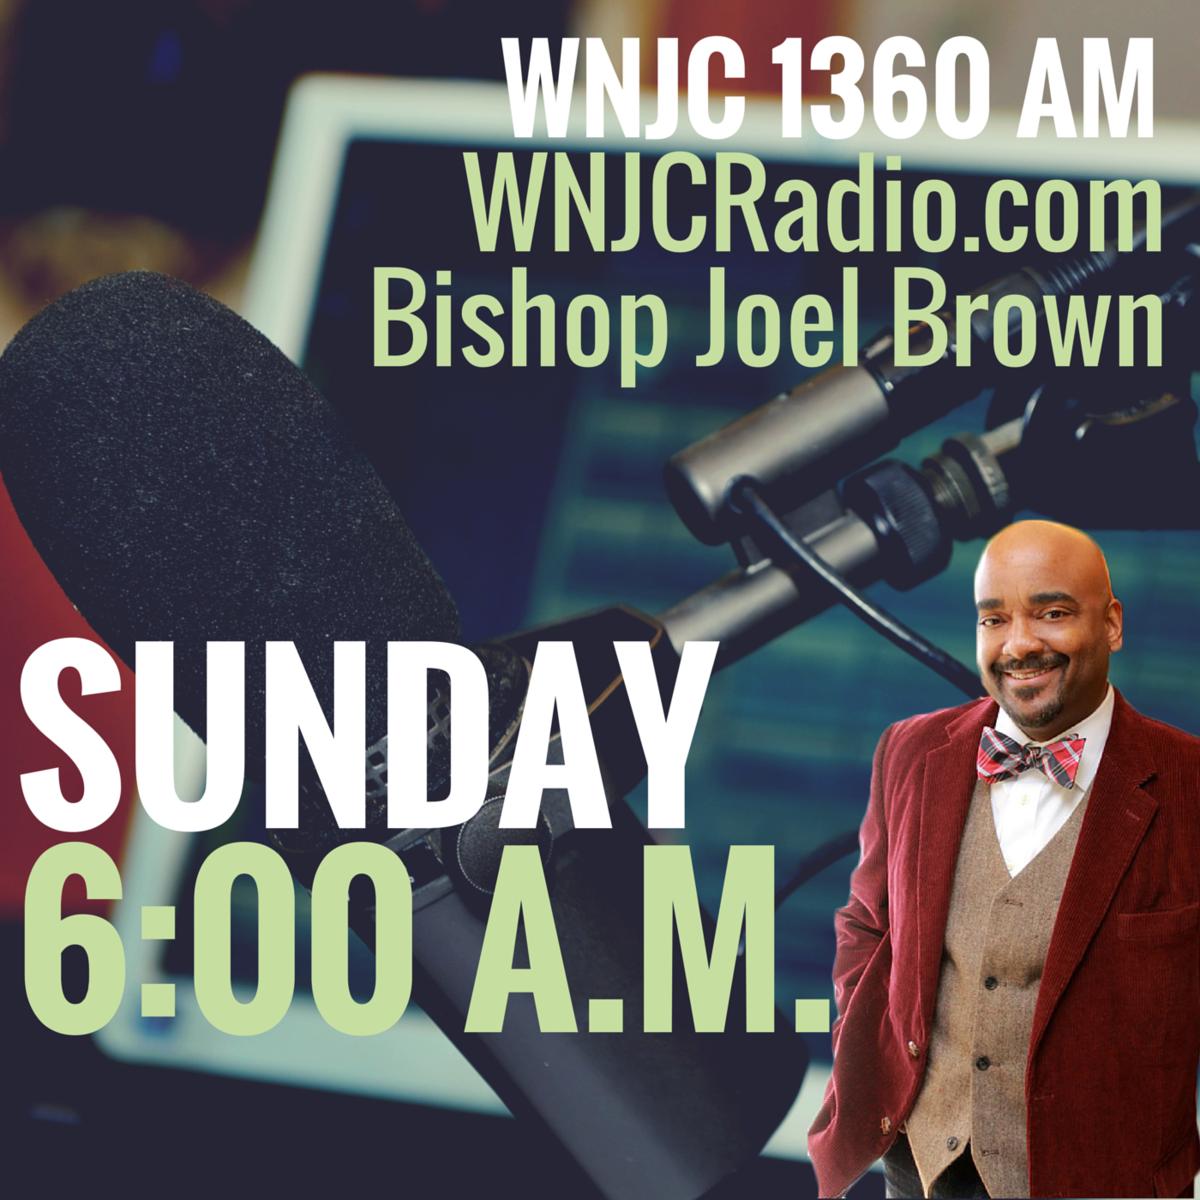 New Radio Broadcast - Bishop Joel Brown on WNJC 1360 AM